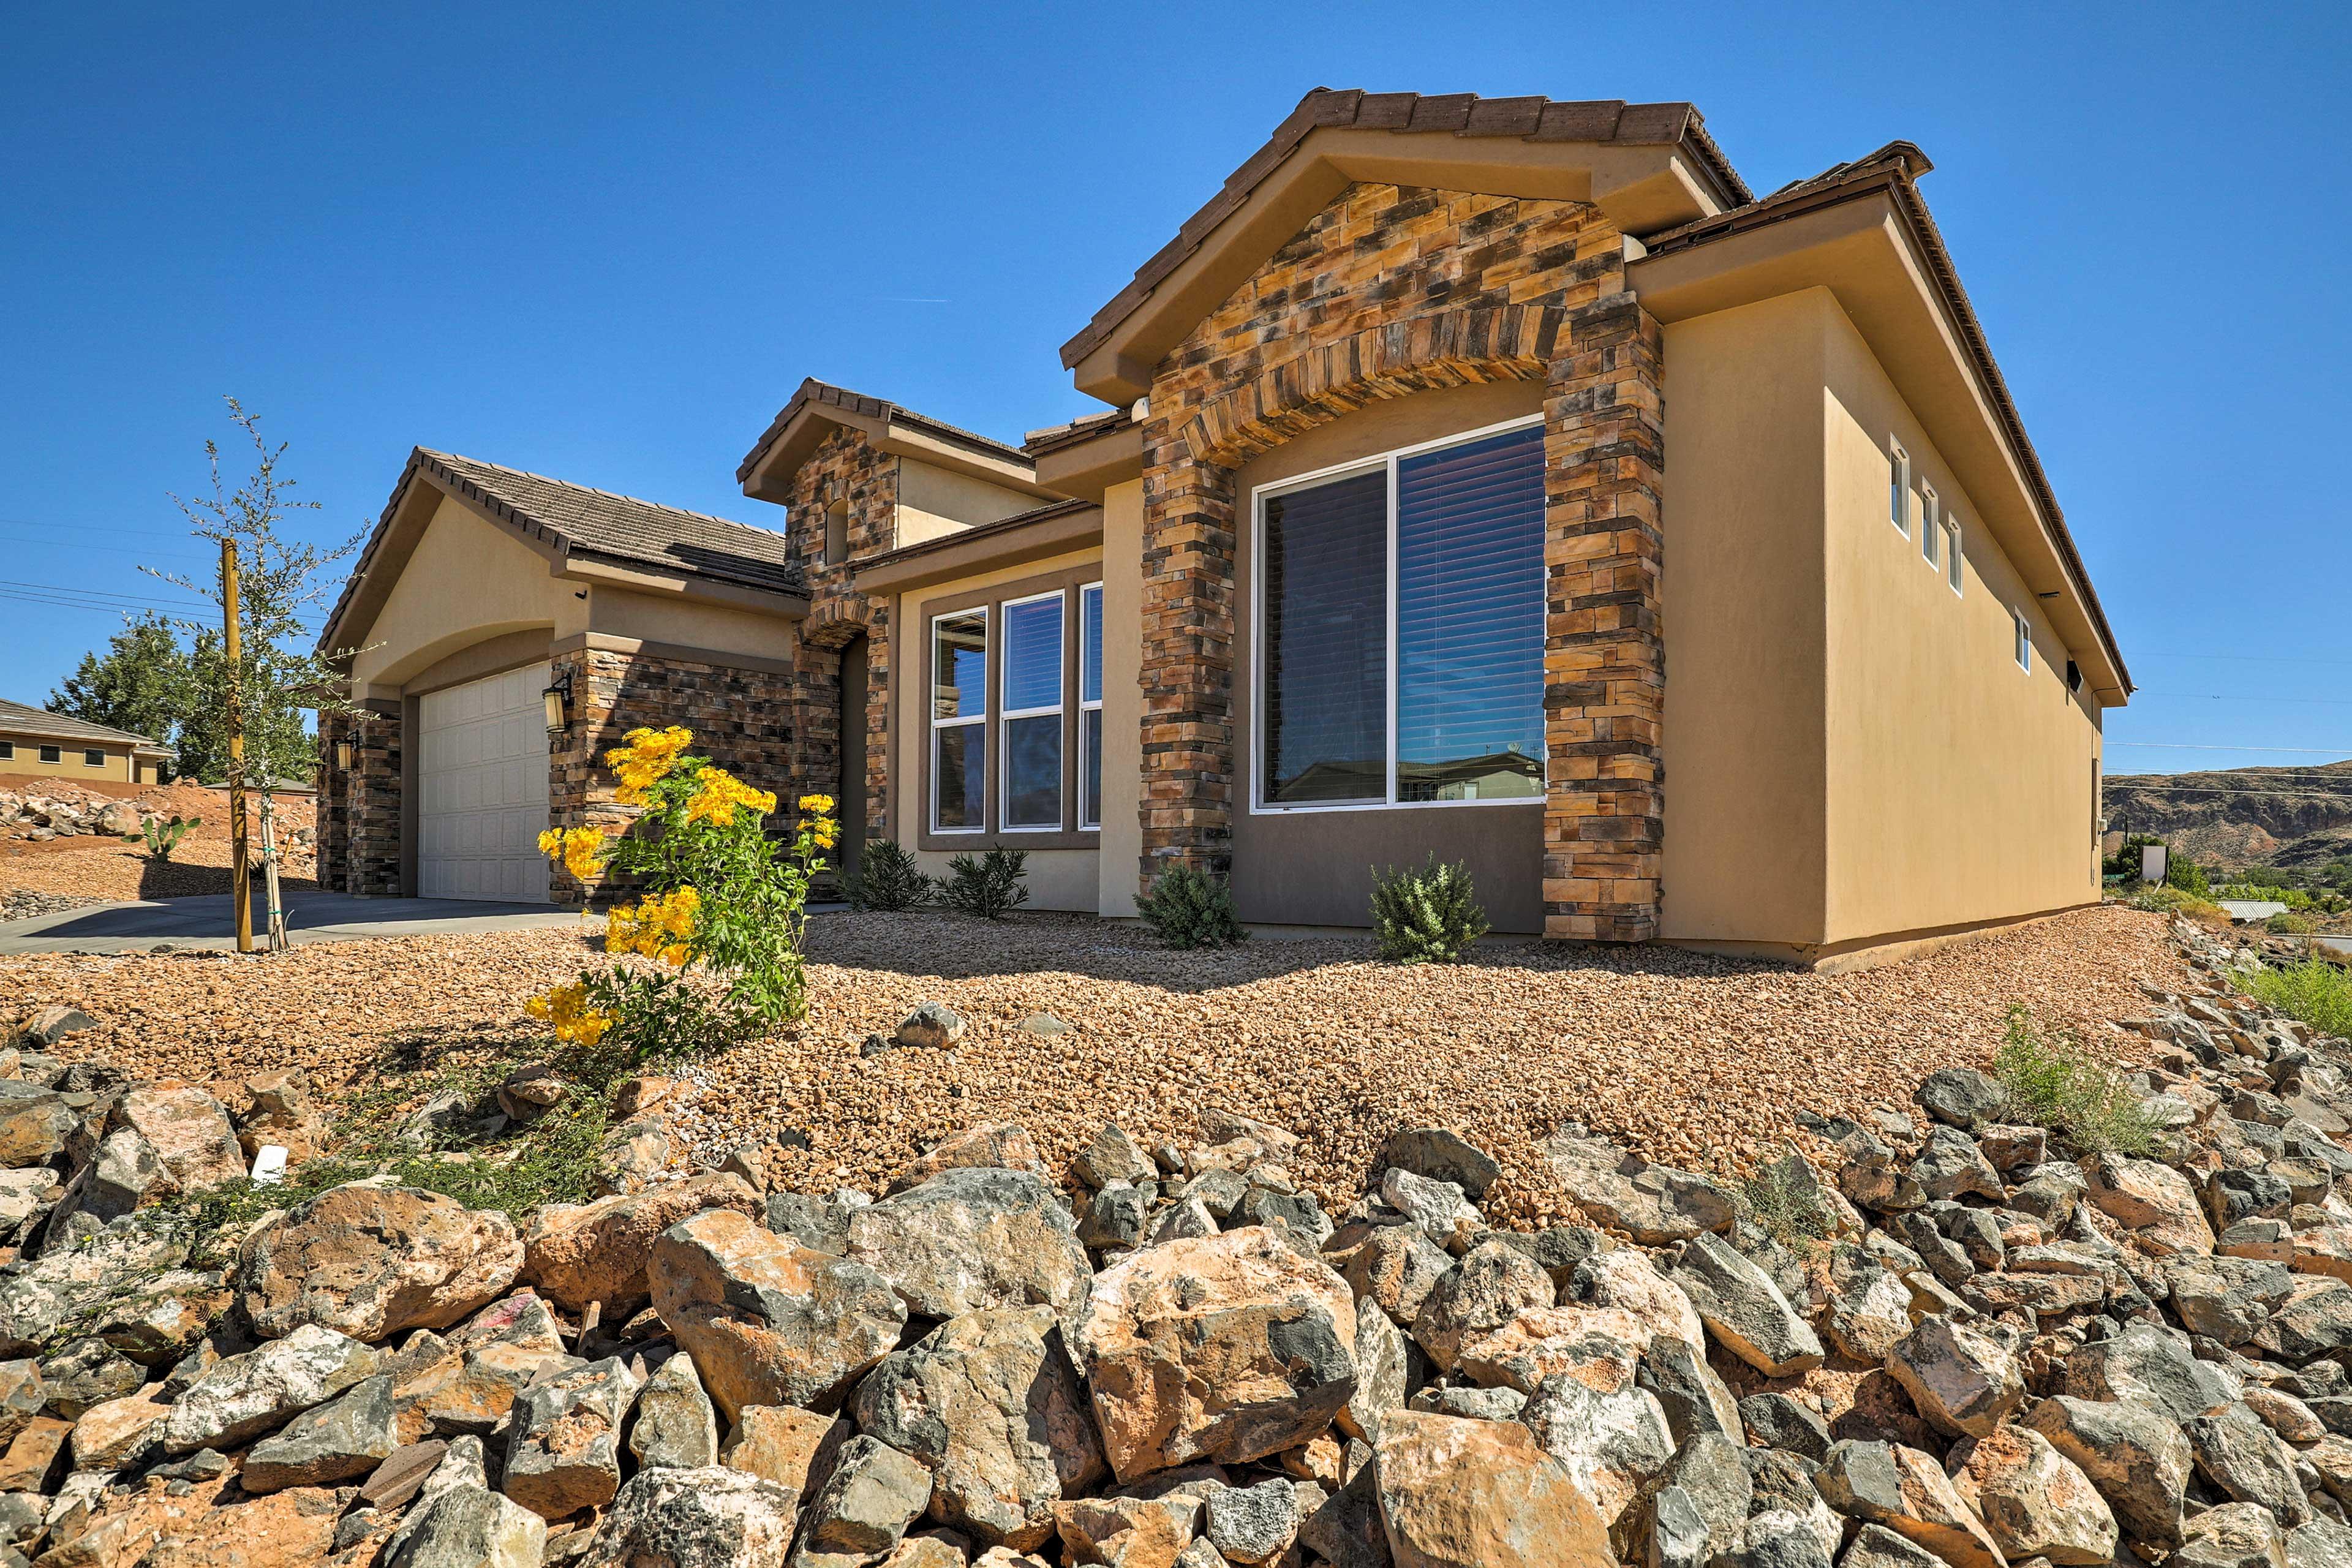 This vacation rental home in La Verkin, Utah is calling your name!